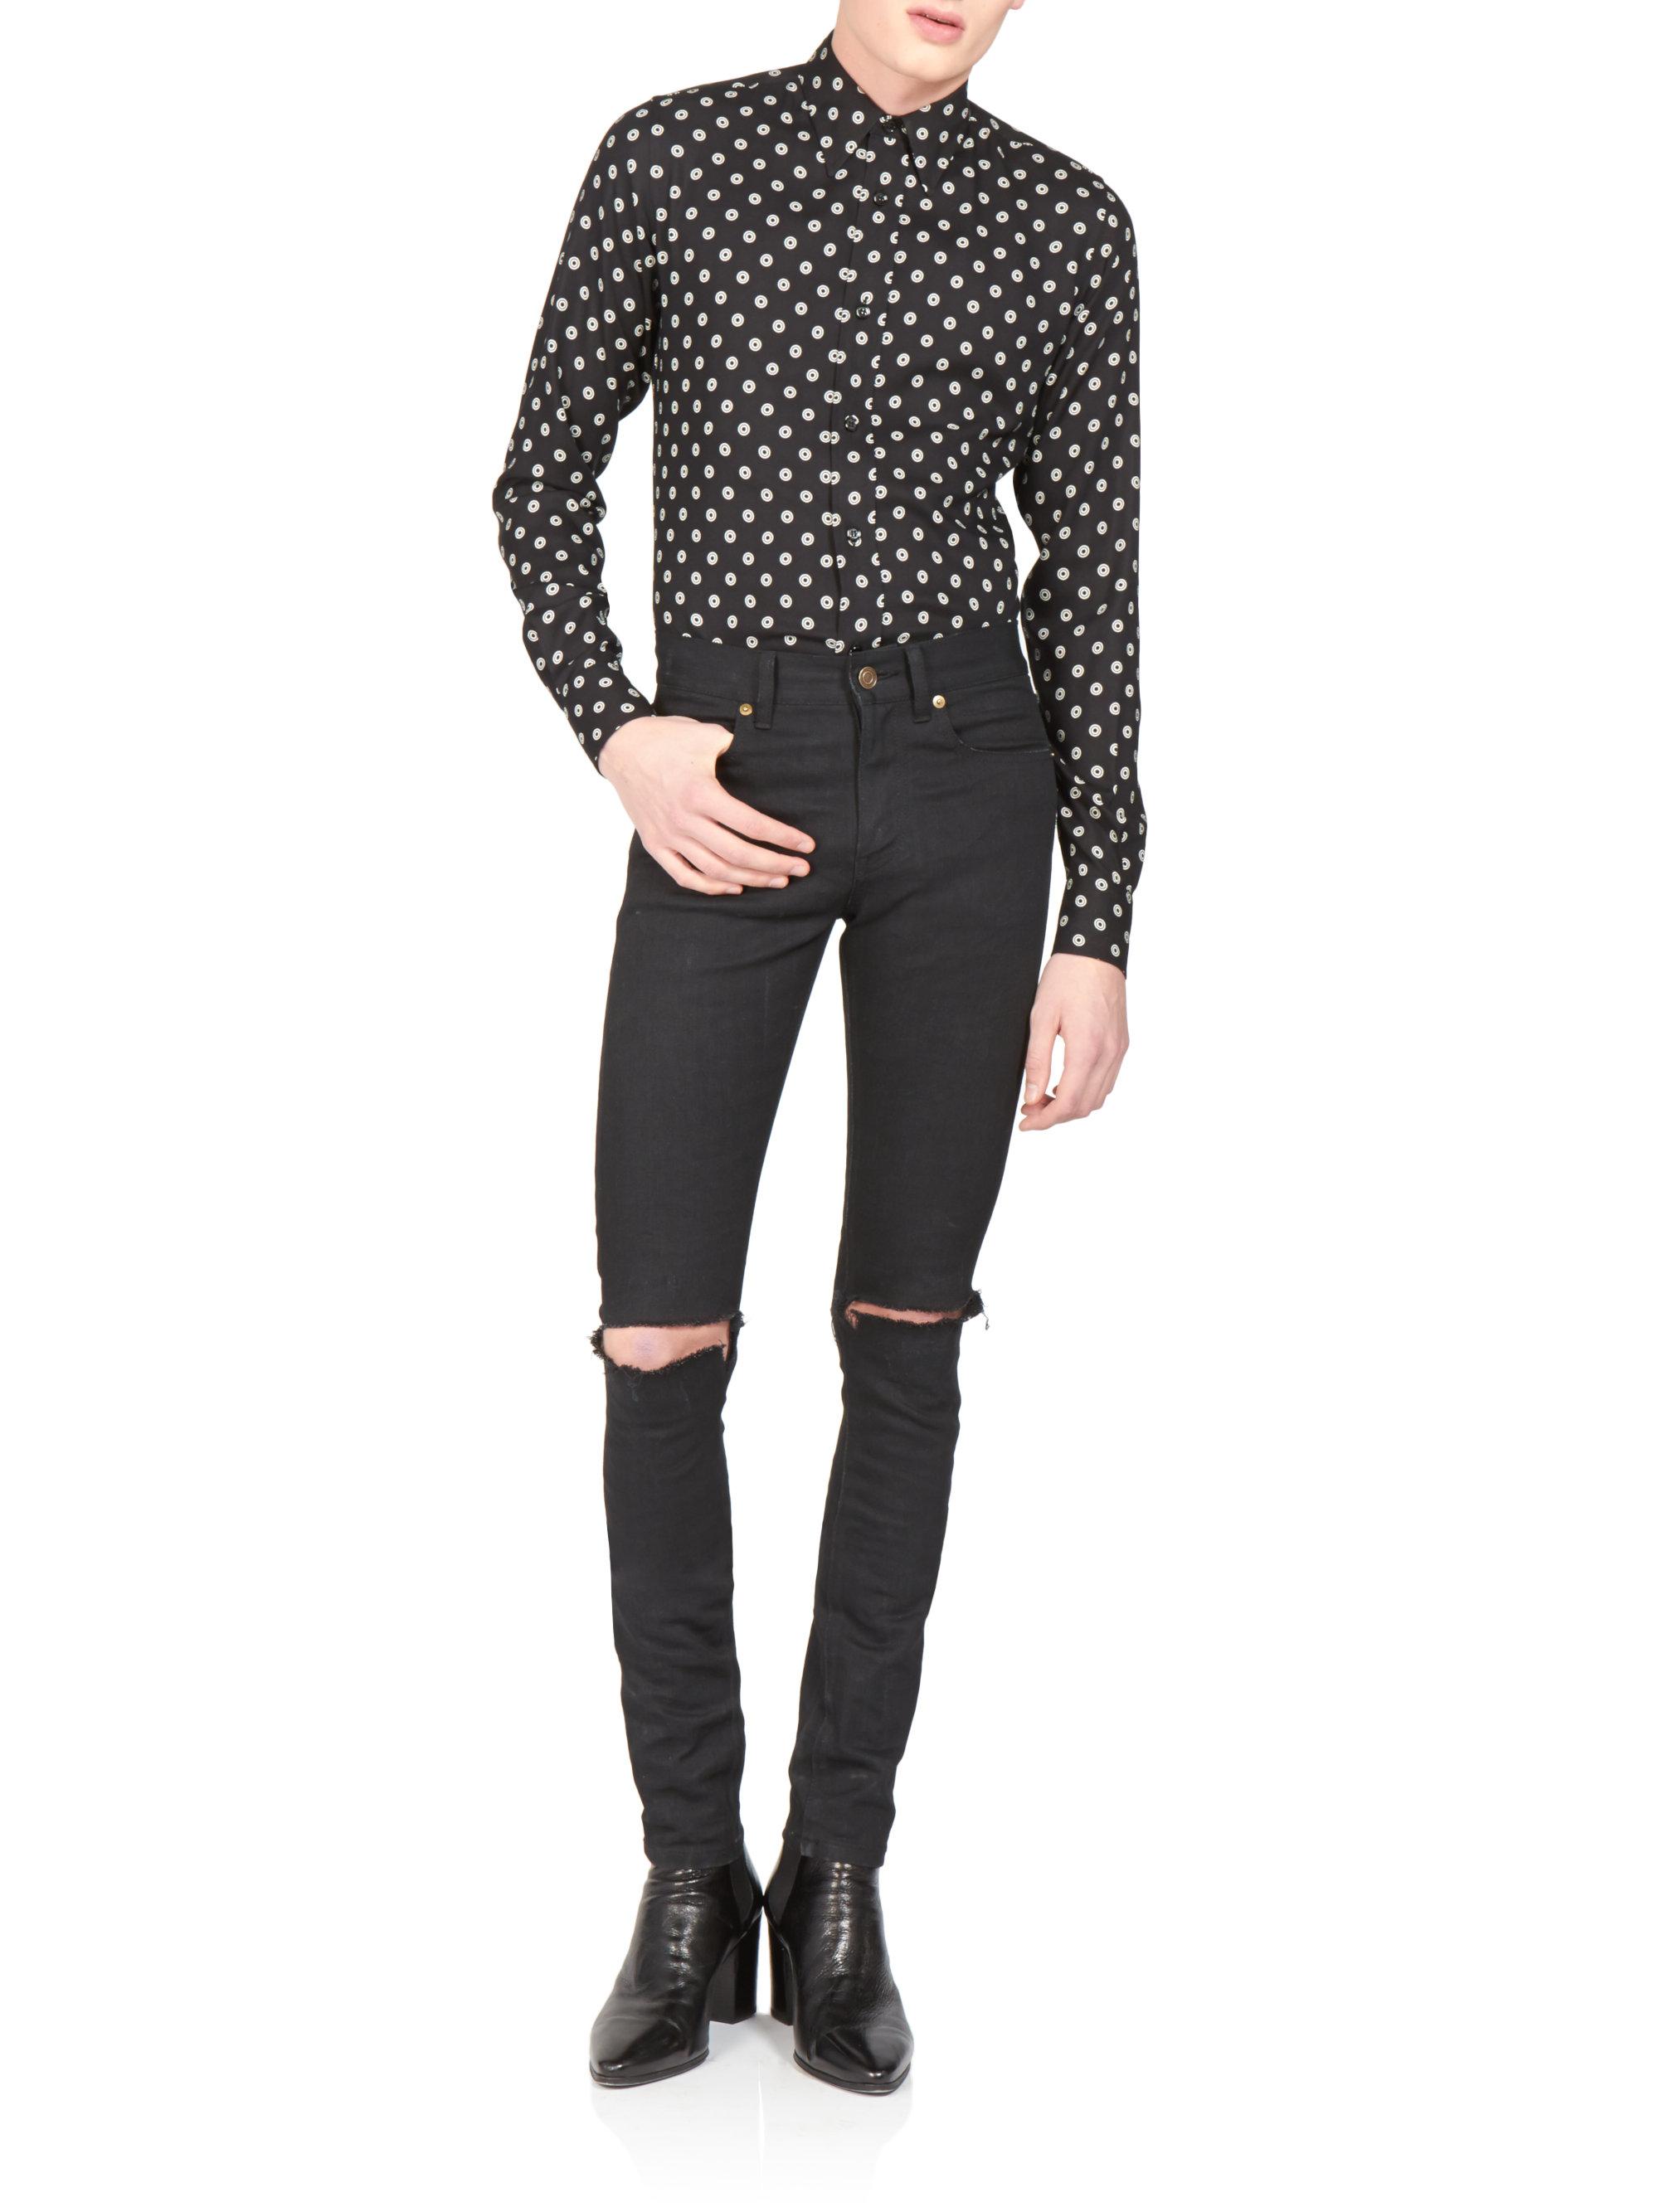 663ec3aabfc Saint Laurent Skinny Distressed Jeans in Black for Men - Lyst